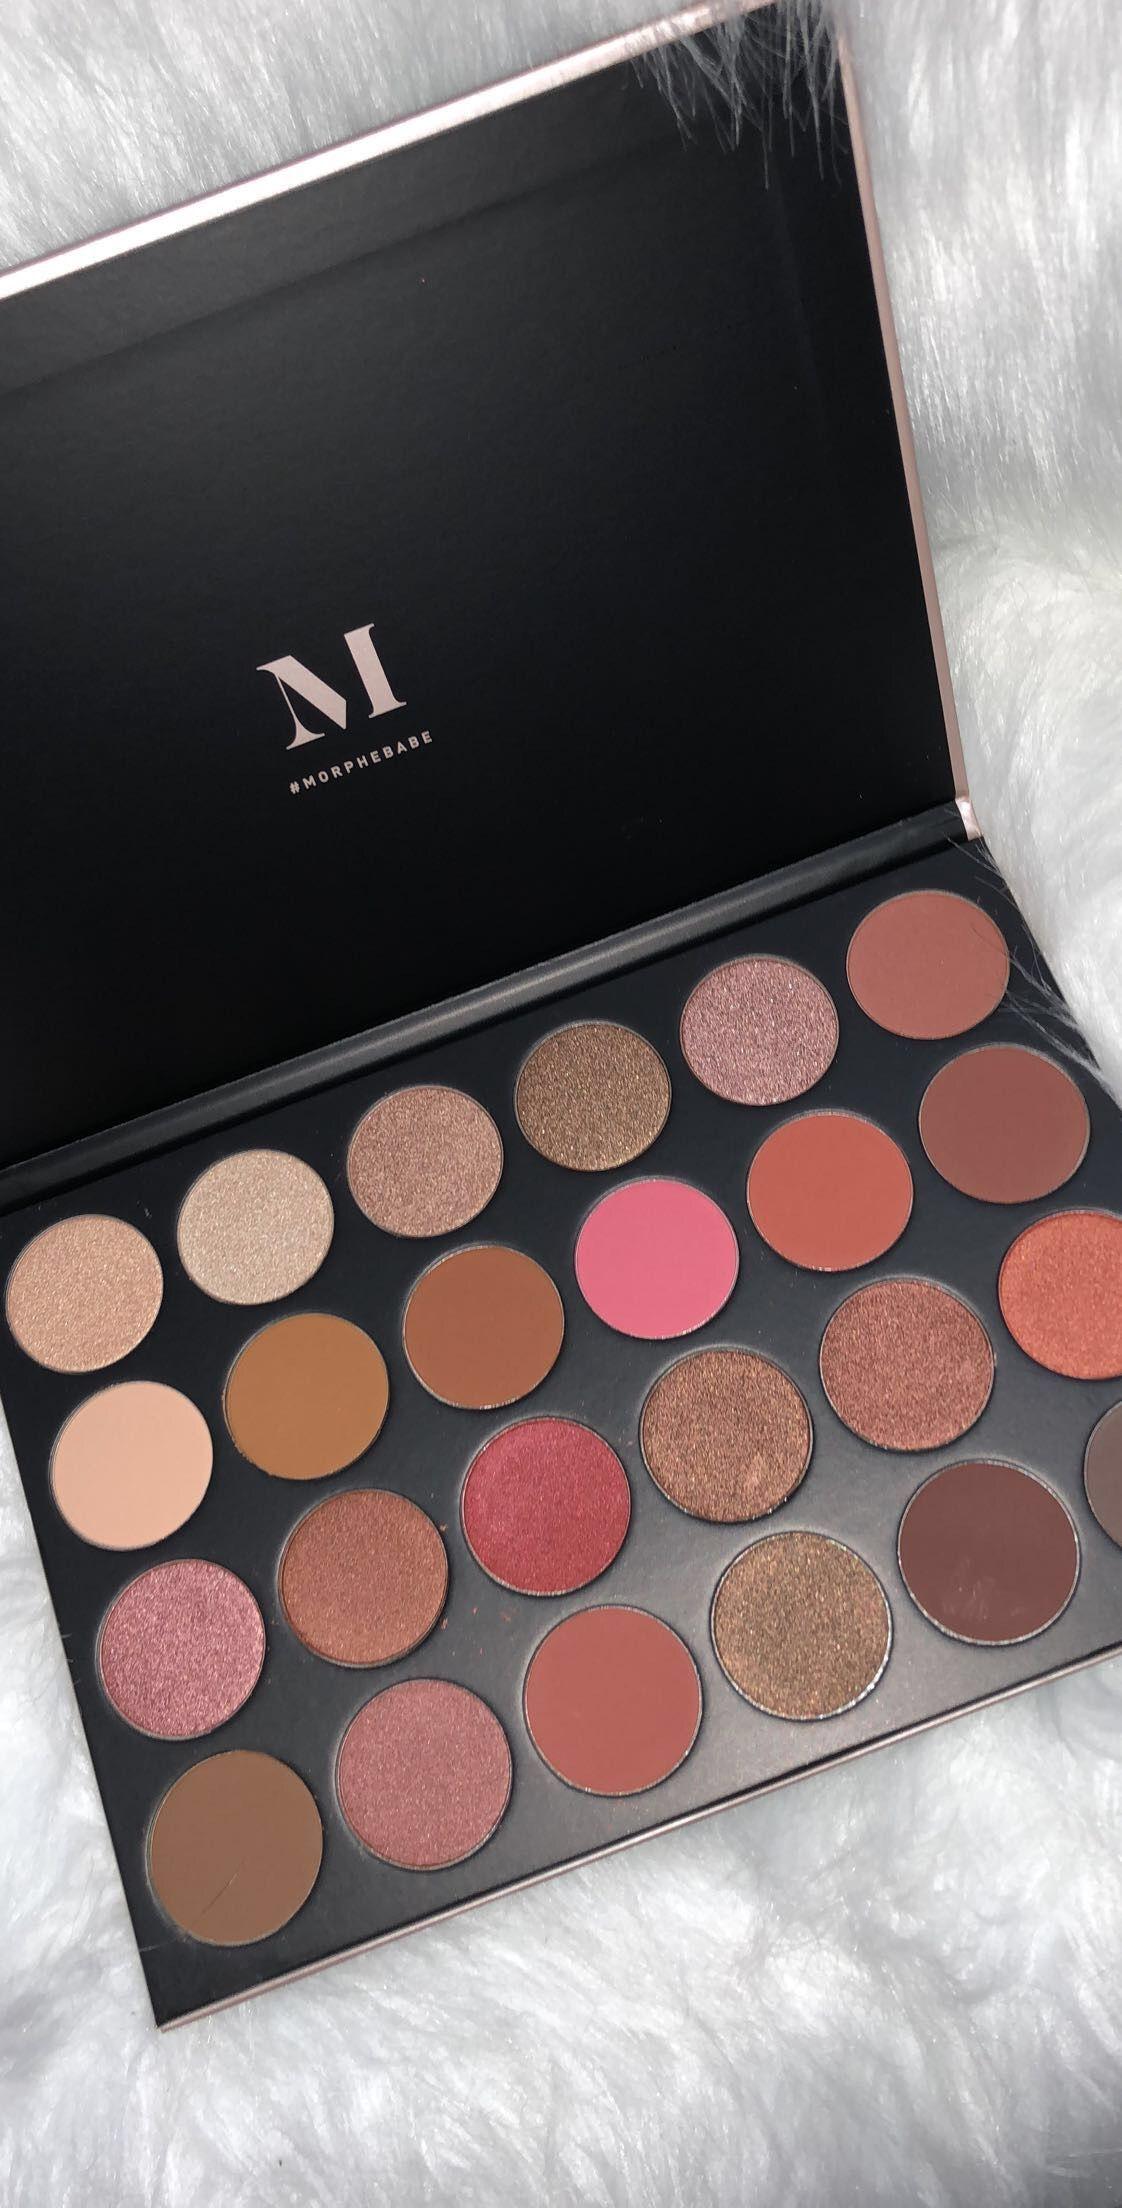 MORPHE PALETTE 💄 | Artistry makeup, Makeup junkie, Makeup